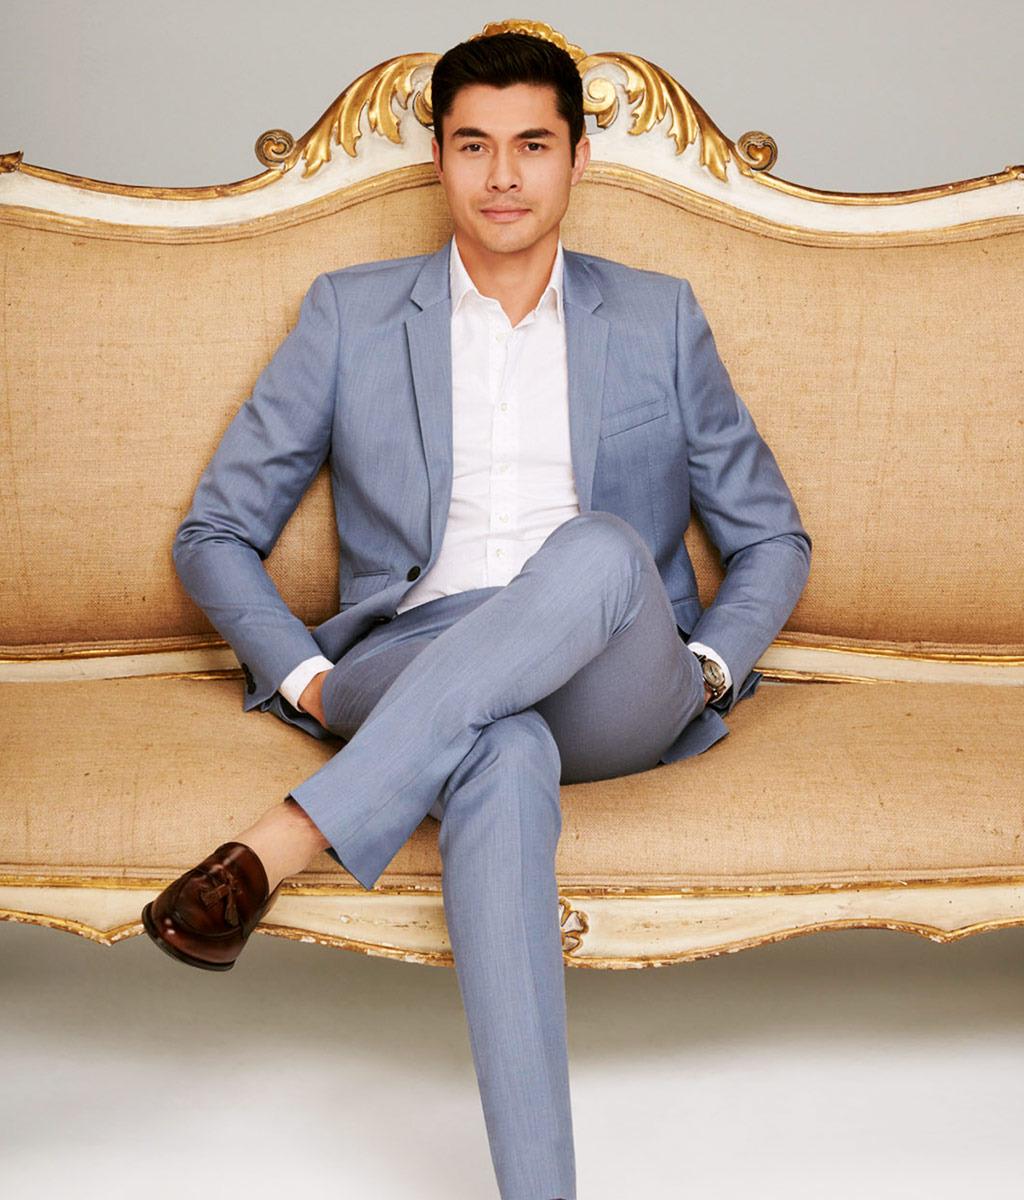 henry golding crazy rich asians style